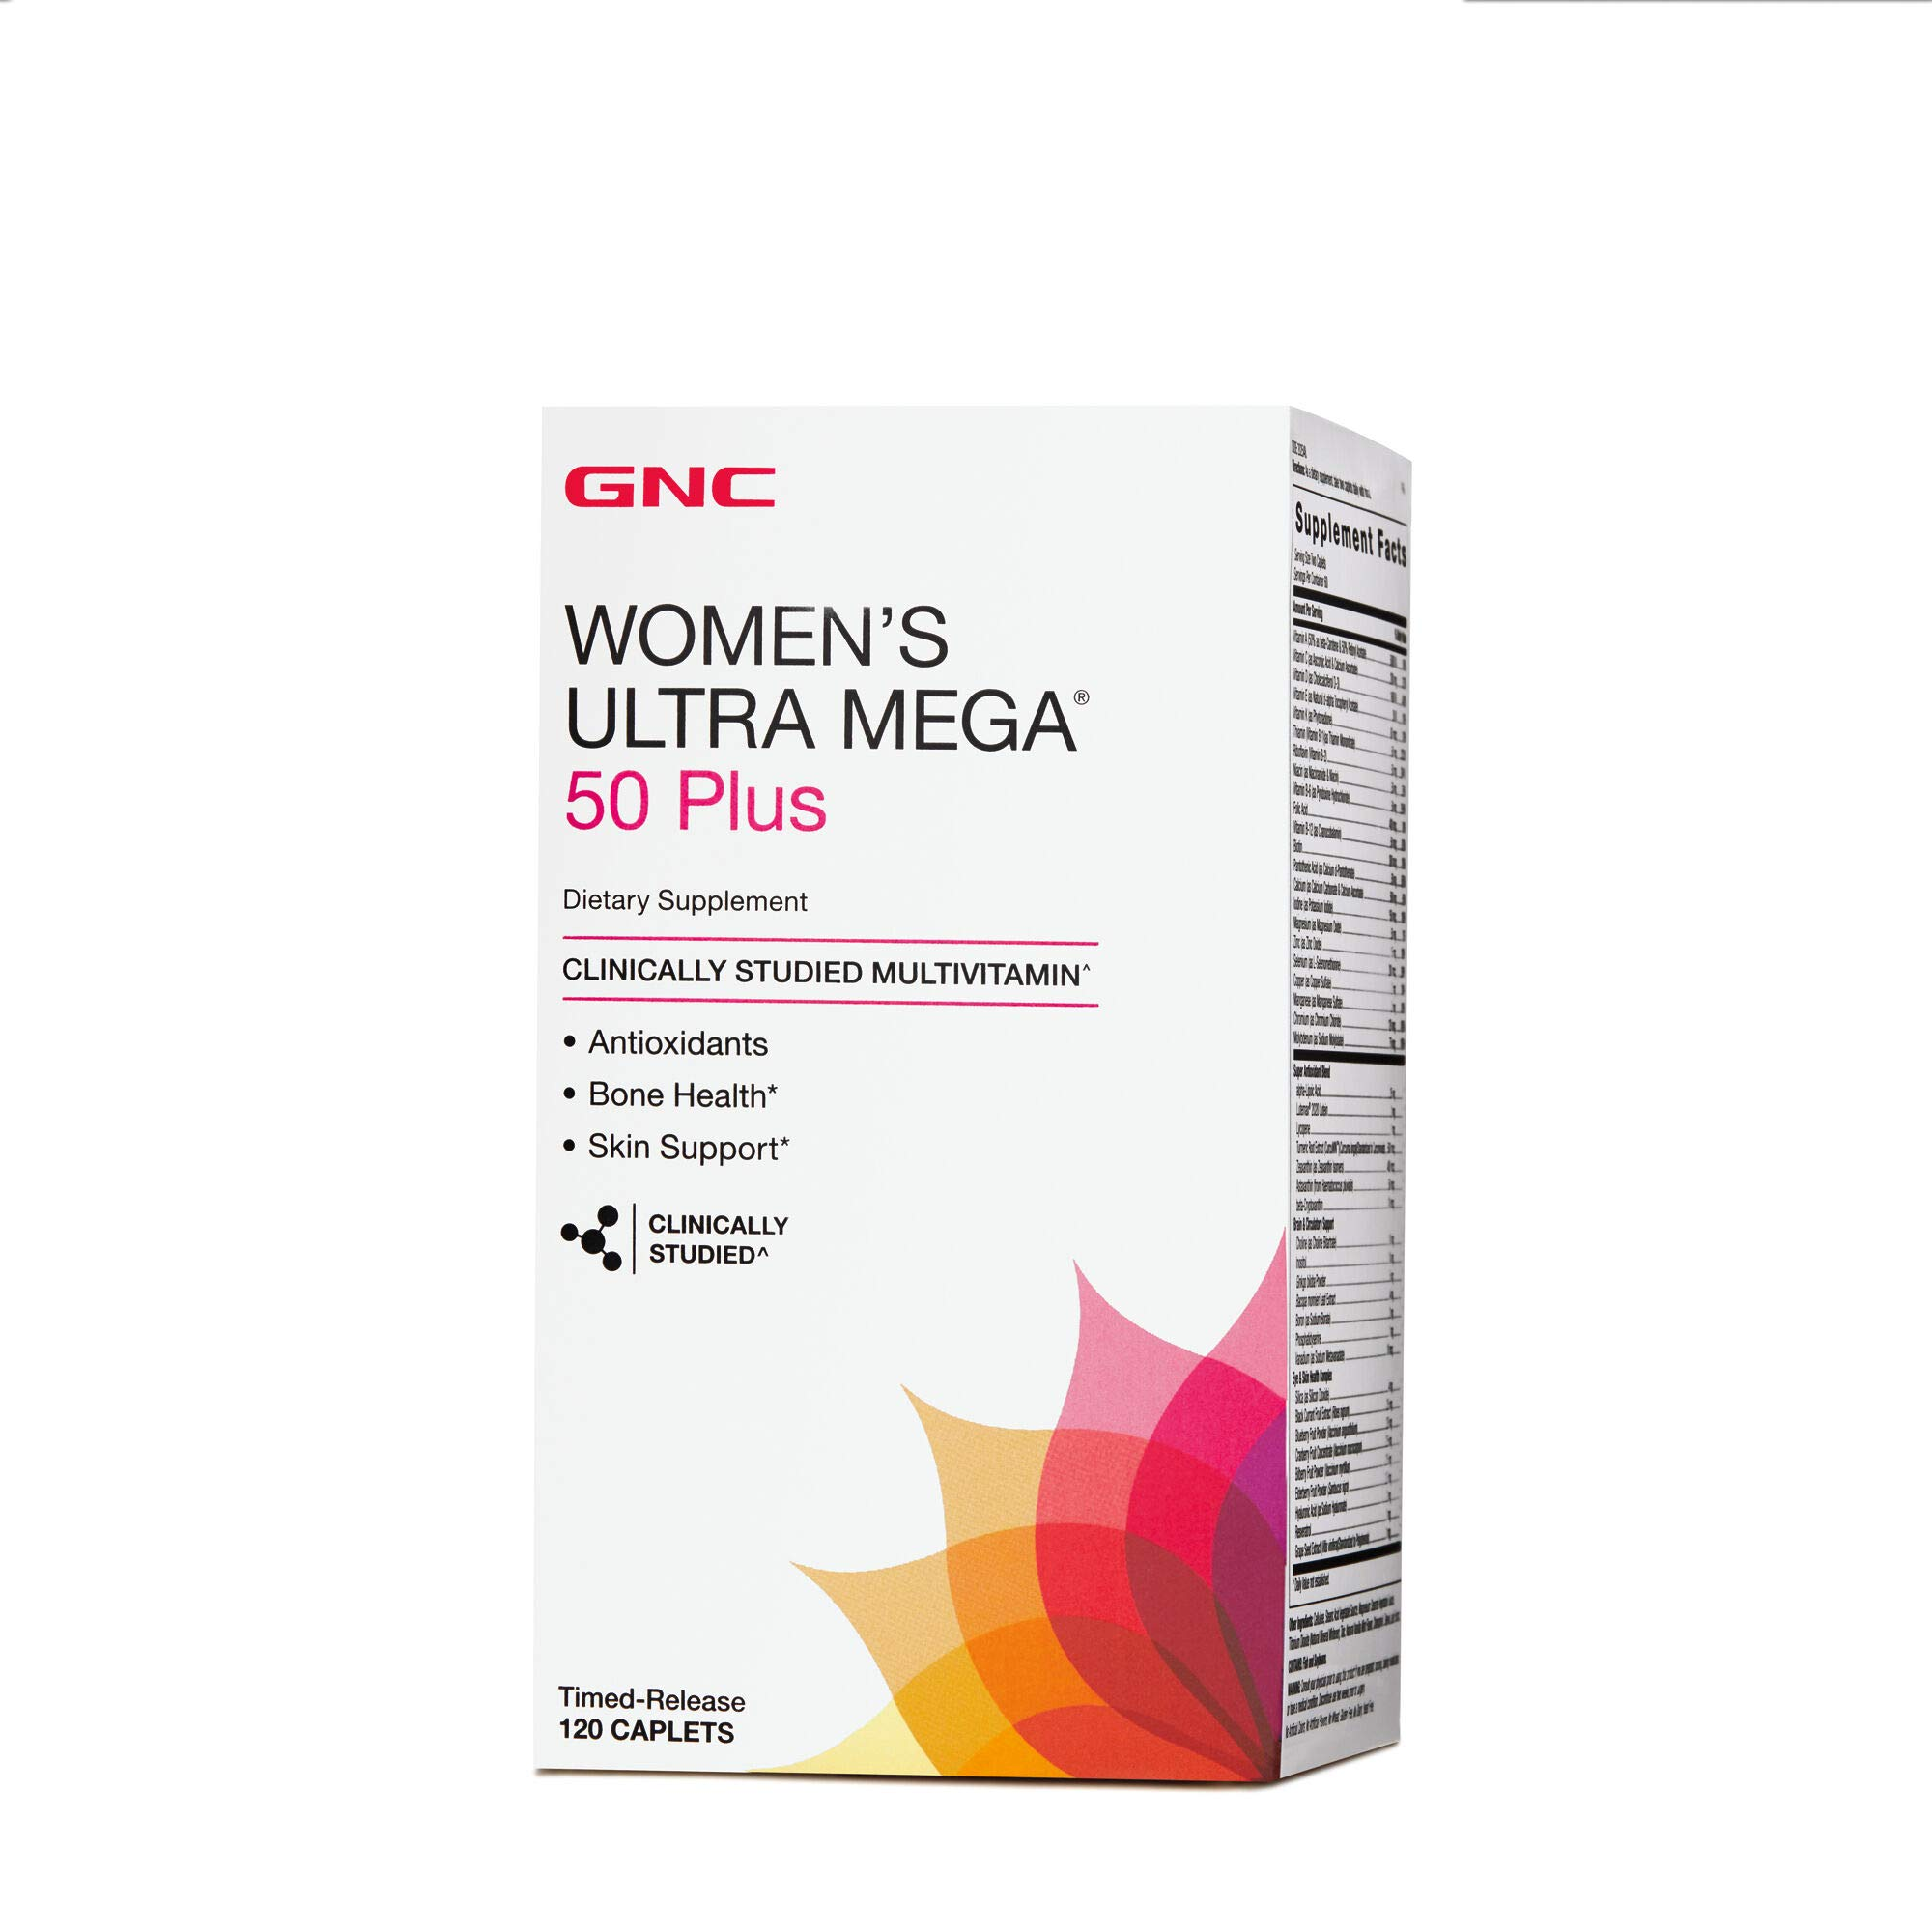 GNC Womens Ultra Mega 50 Plus Multivitamin for Women, 120 Count, Vitamin, Multivitamin by GNC